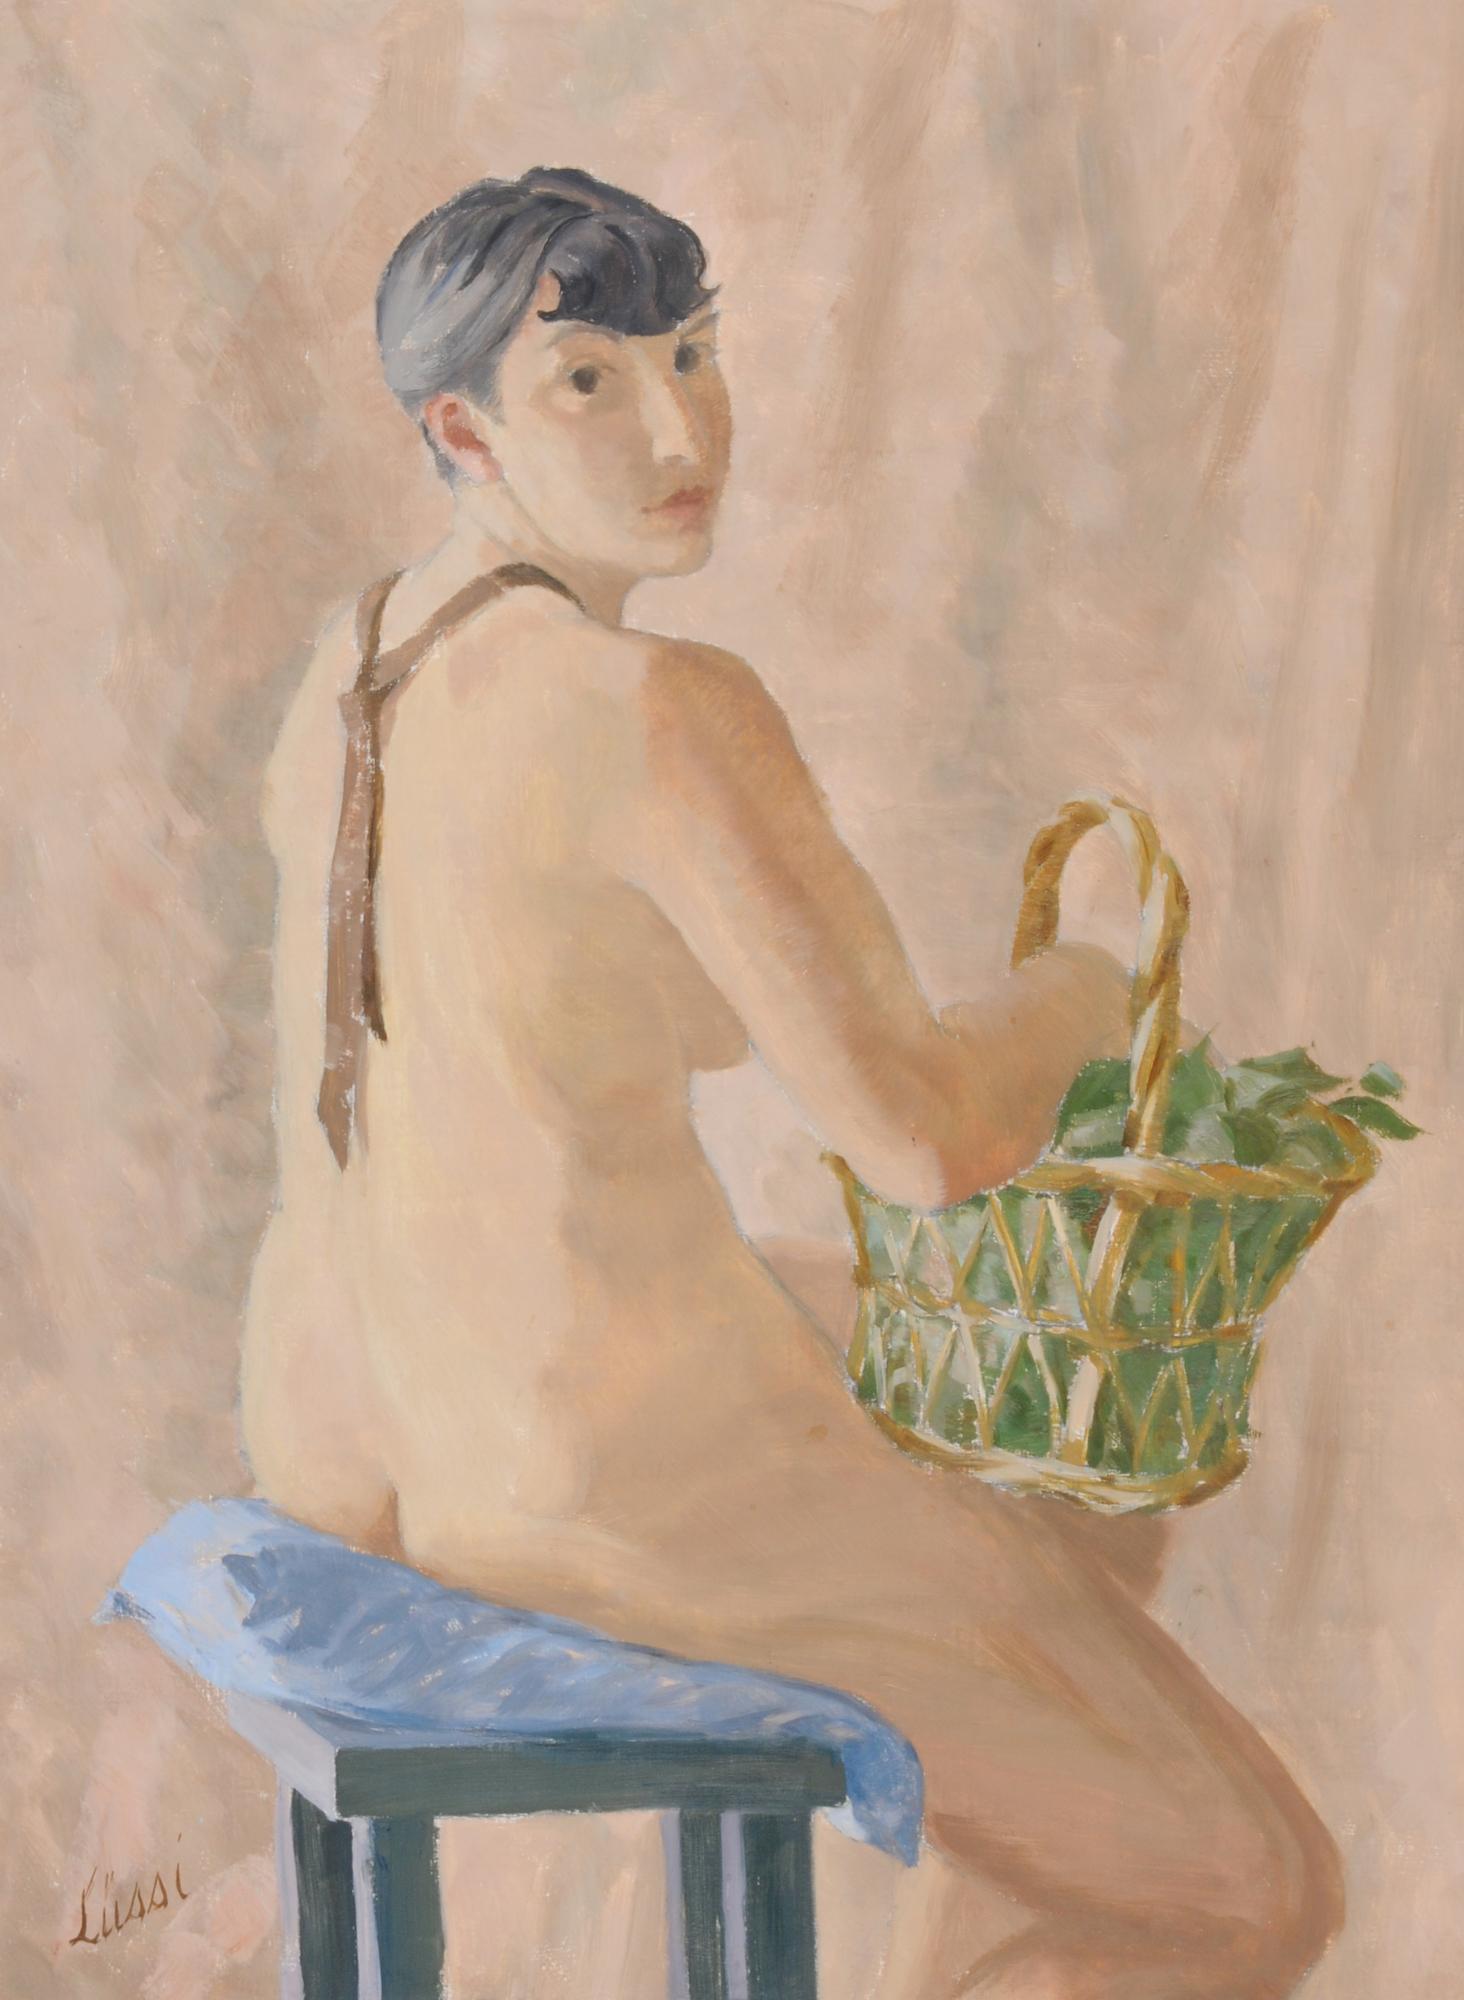 Lüssi Otto, Akt mit Korb (Nude with Basket)